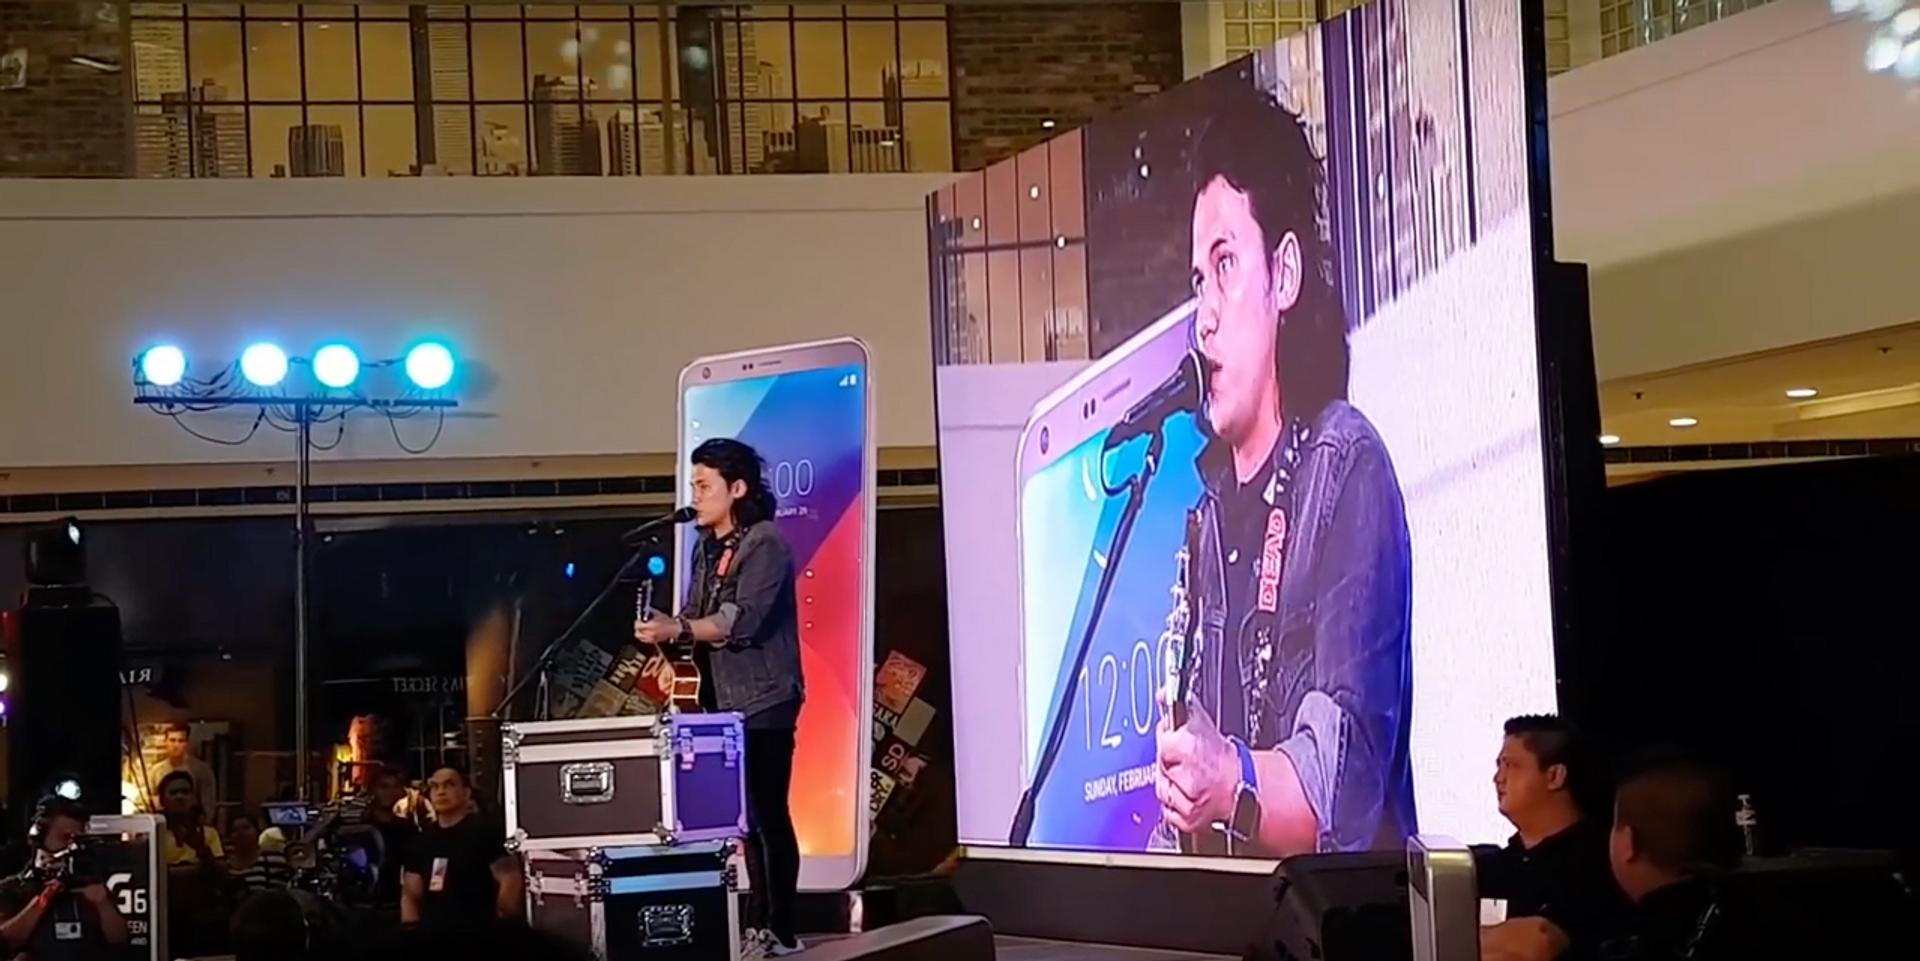 Sponge Cola's Yael Yuzon translates 'Jeepney' to English at mobile phone launch